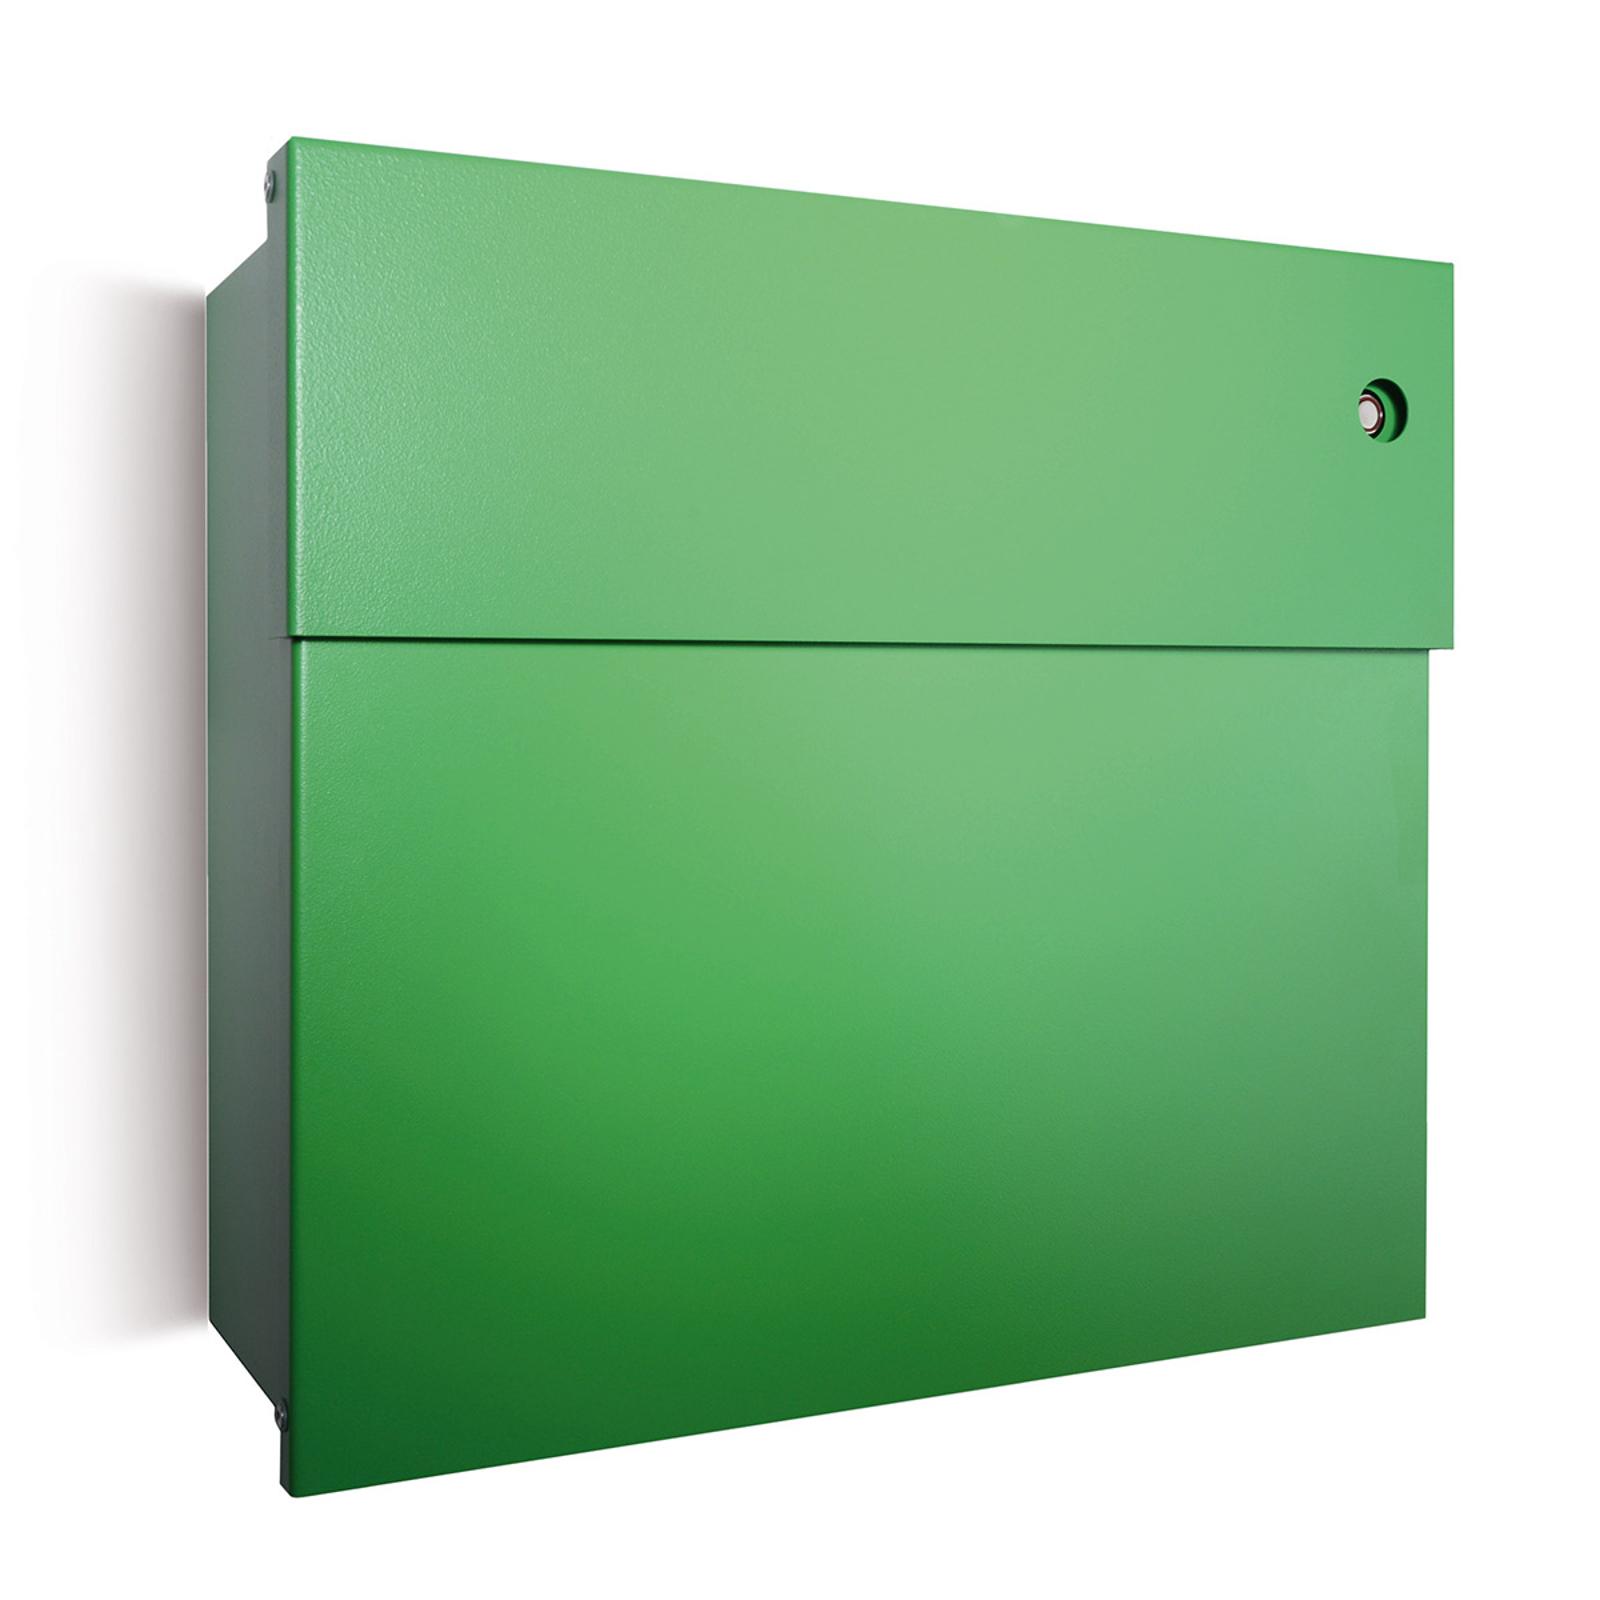 Buzón Letterman IV, timbre rojo, verde